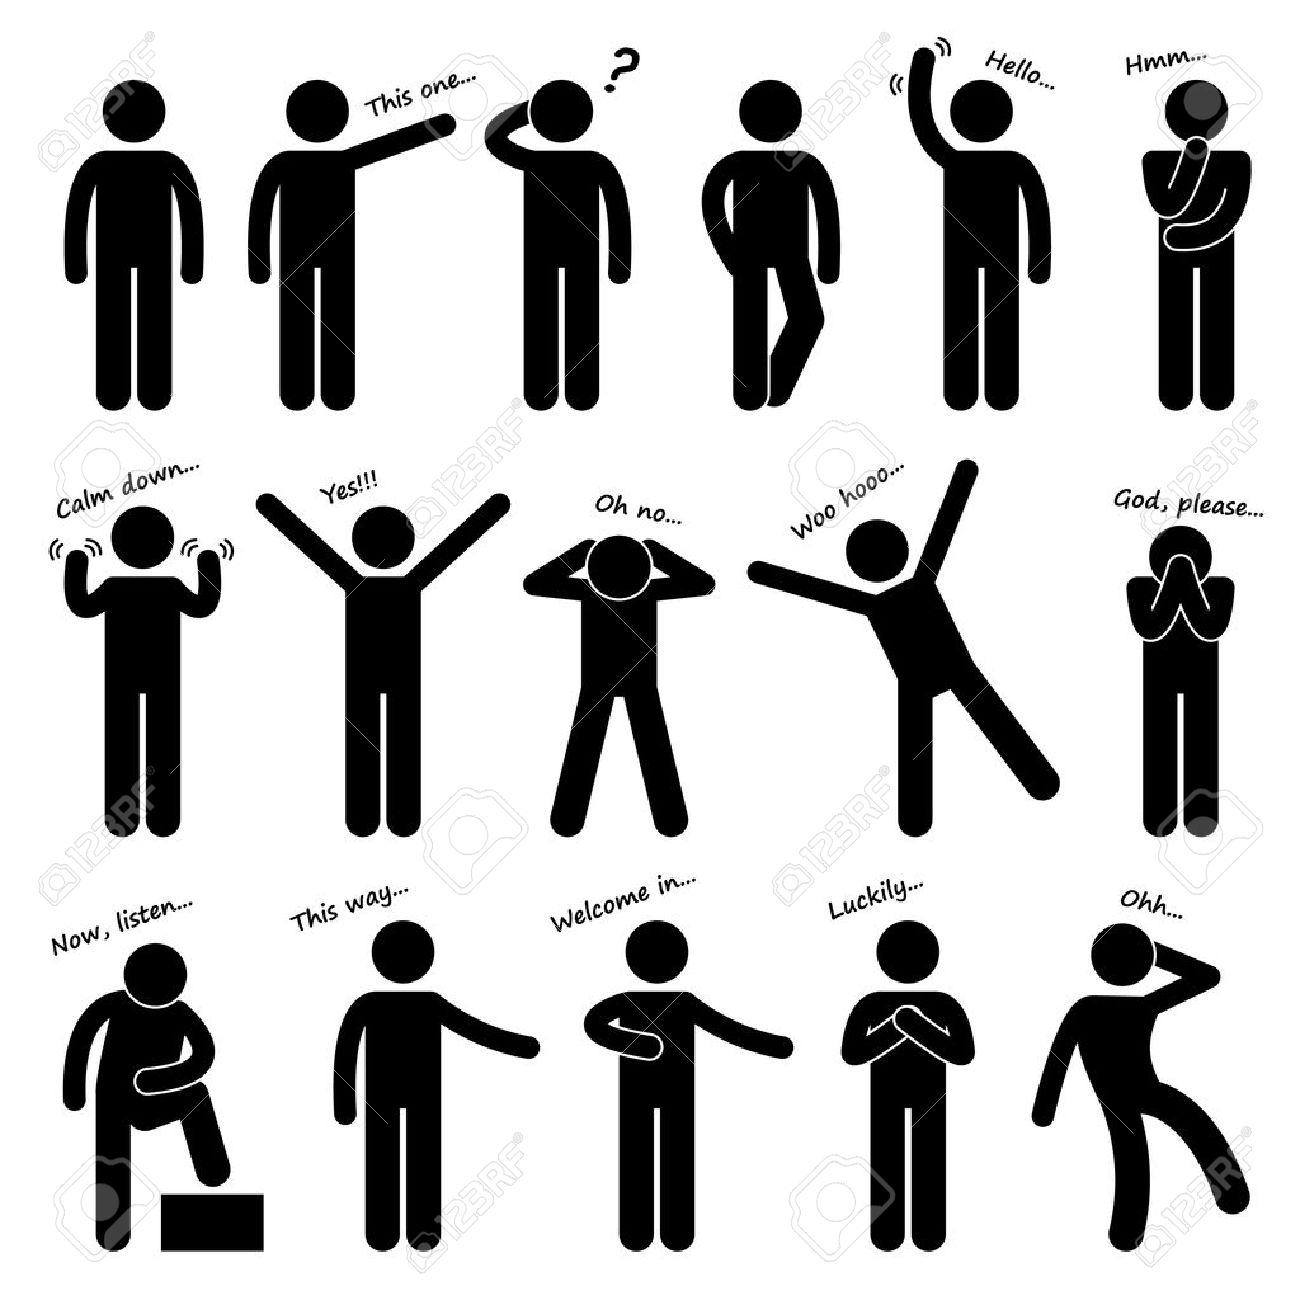 Man People Person Basic Body Language Posture Stick Figure Pictogram Icon Stock Vector - 18911138